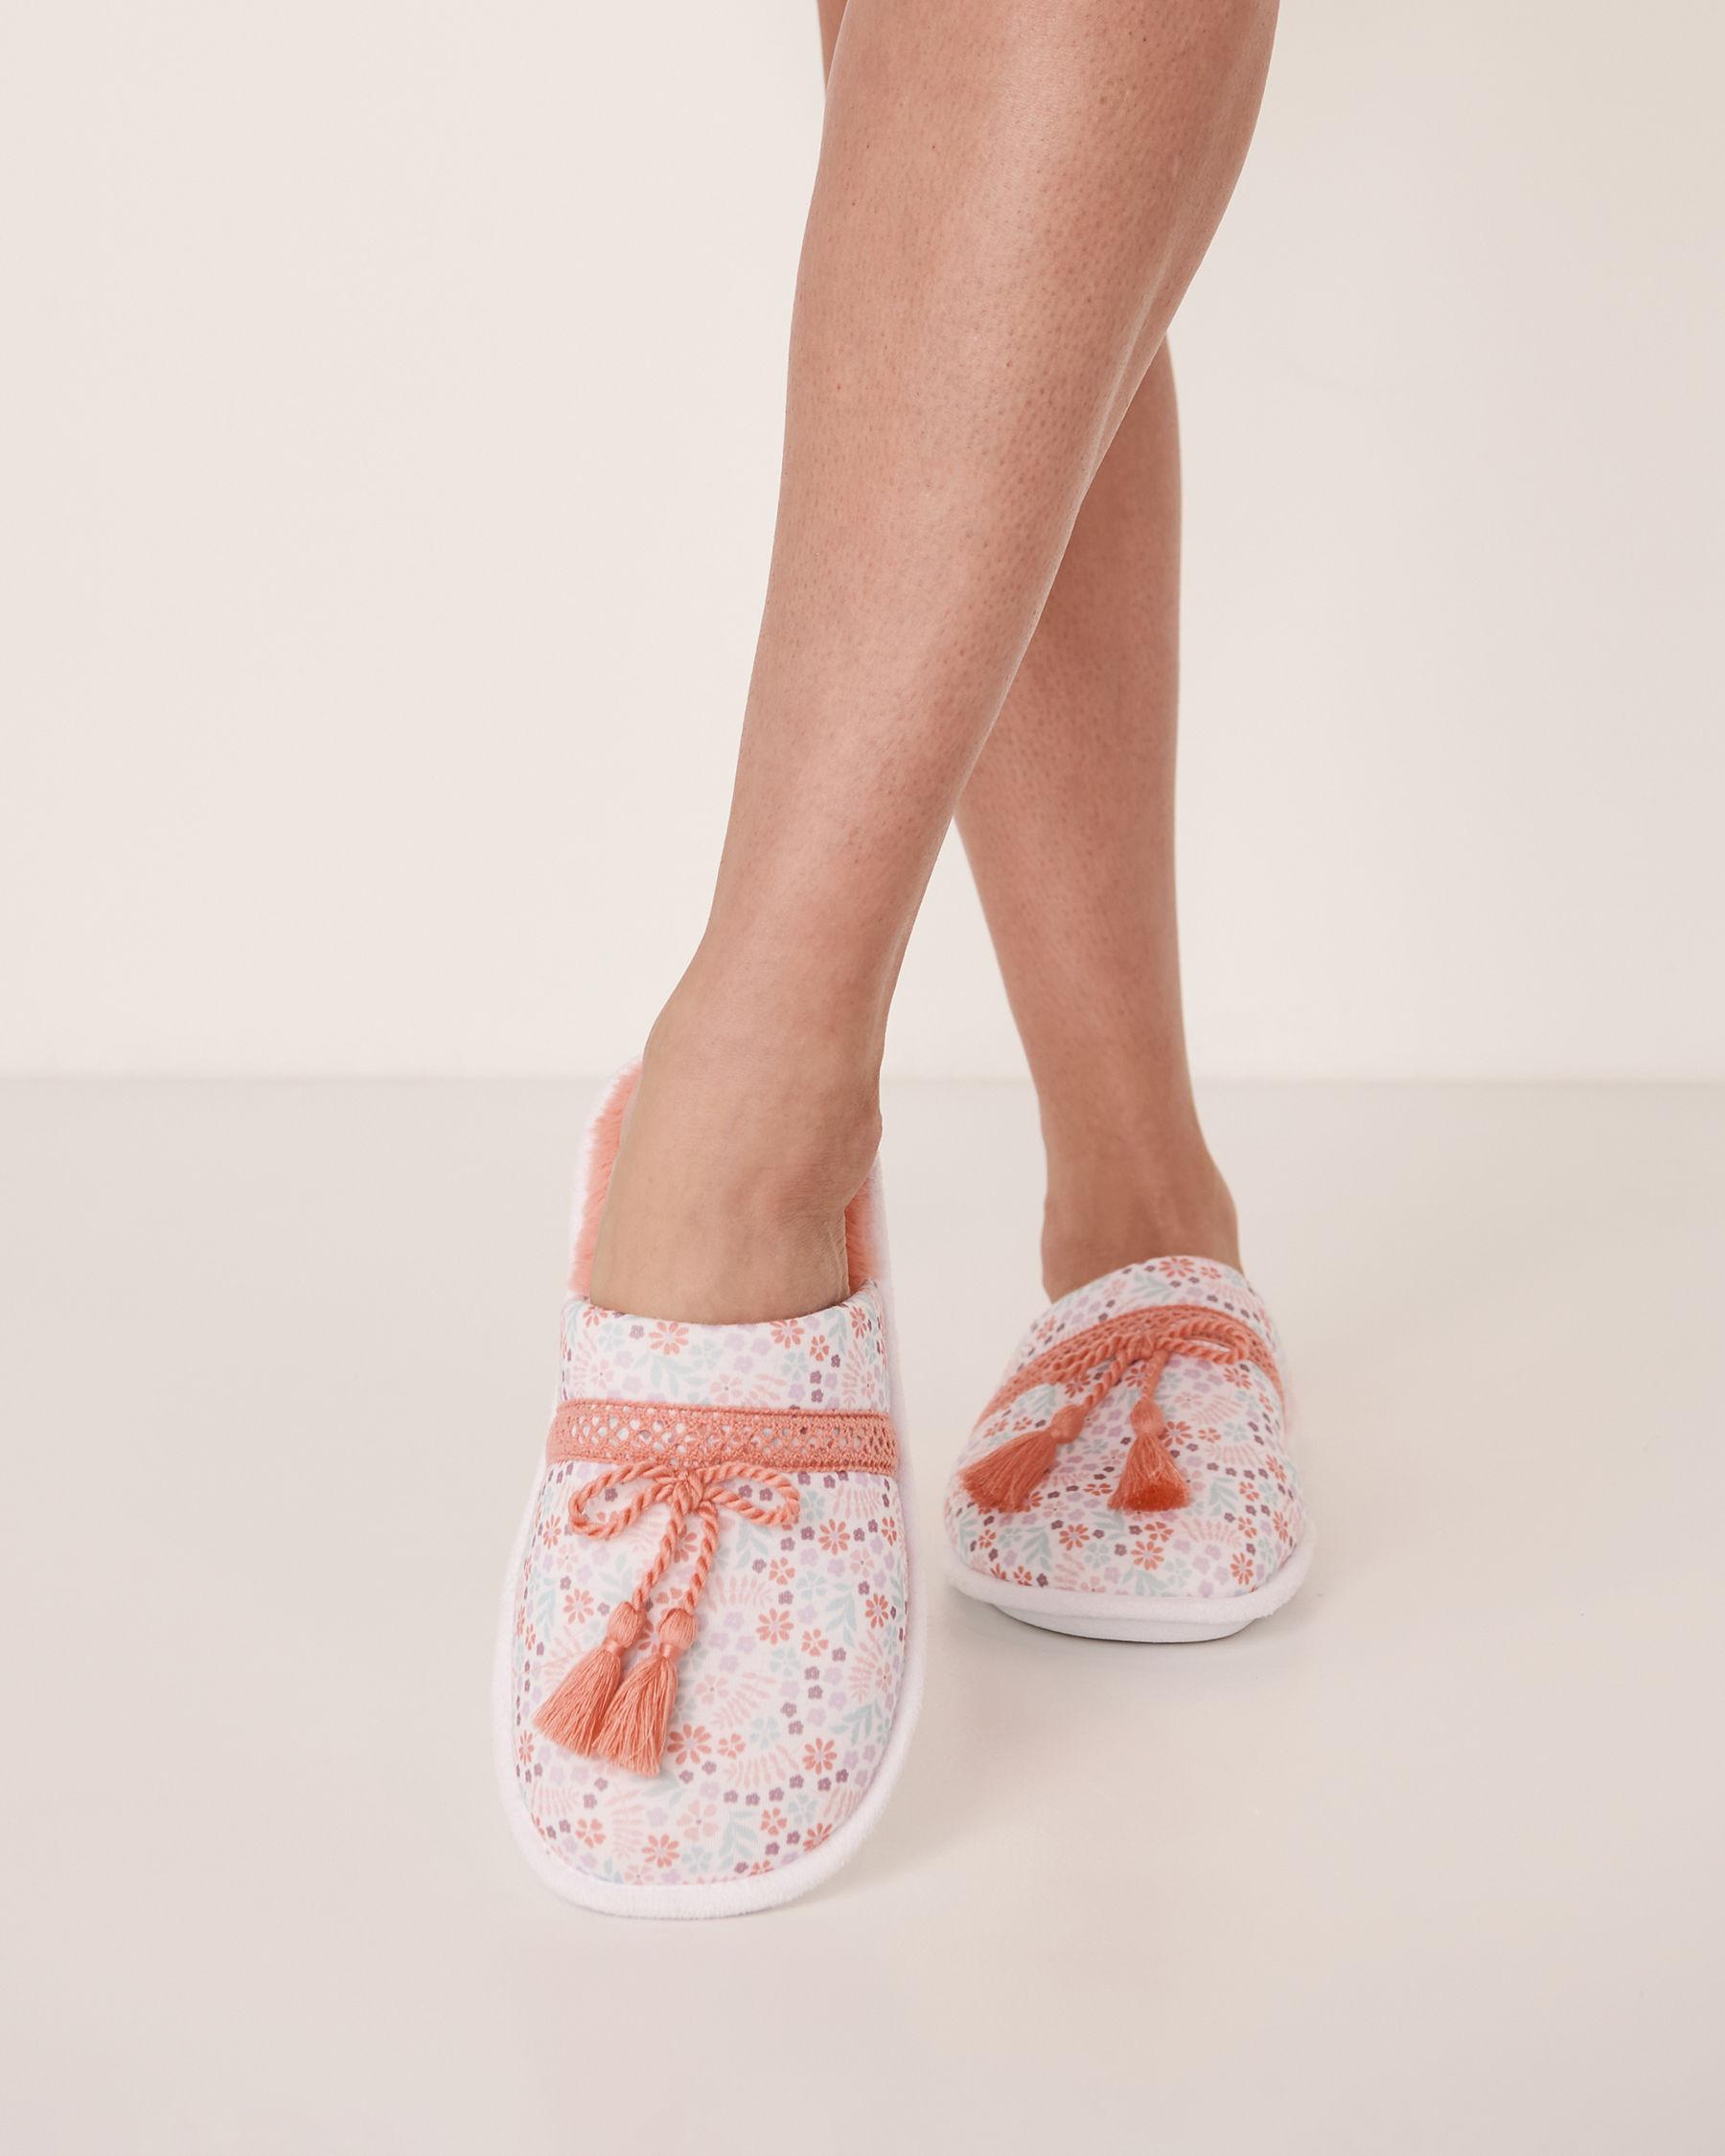 LA VIE EN ROSE Clog Slippers with Tassels Ditsy floral 40700013 - View1